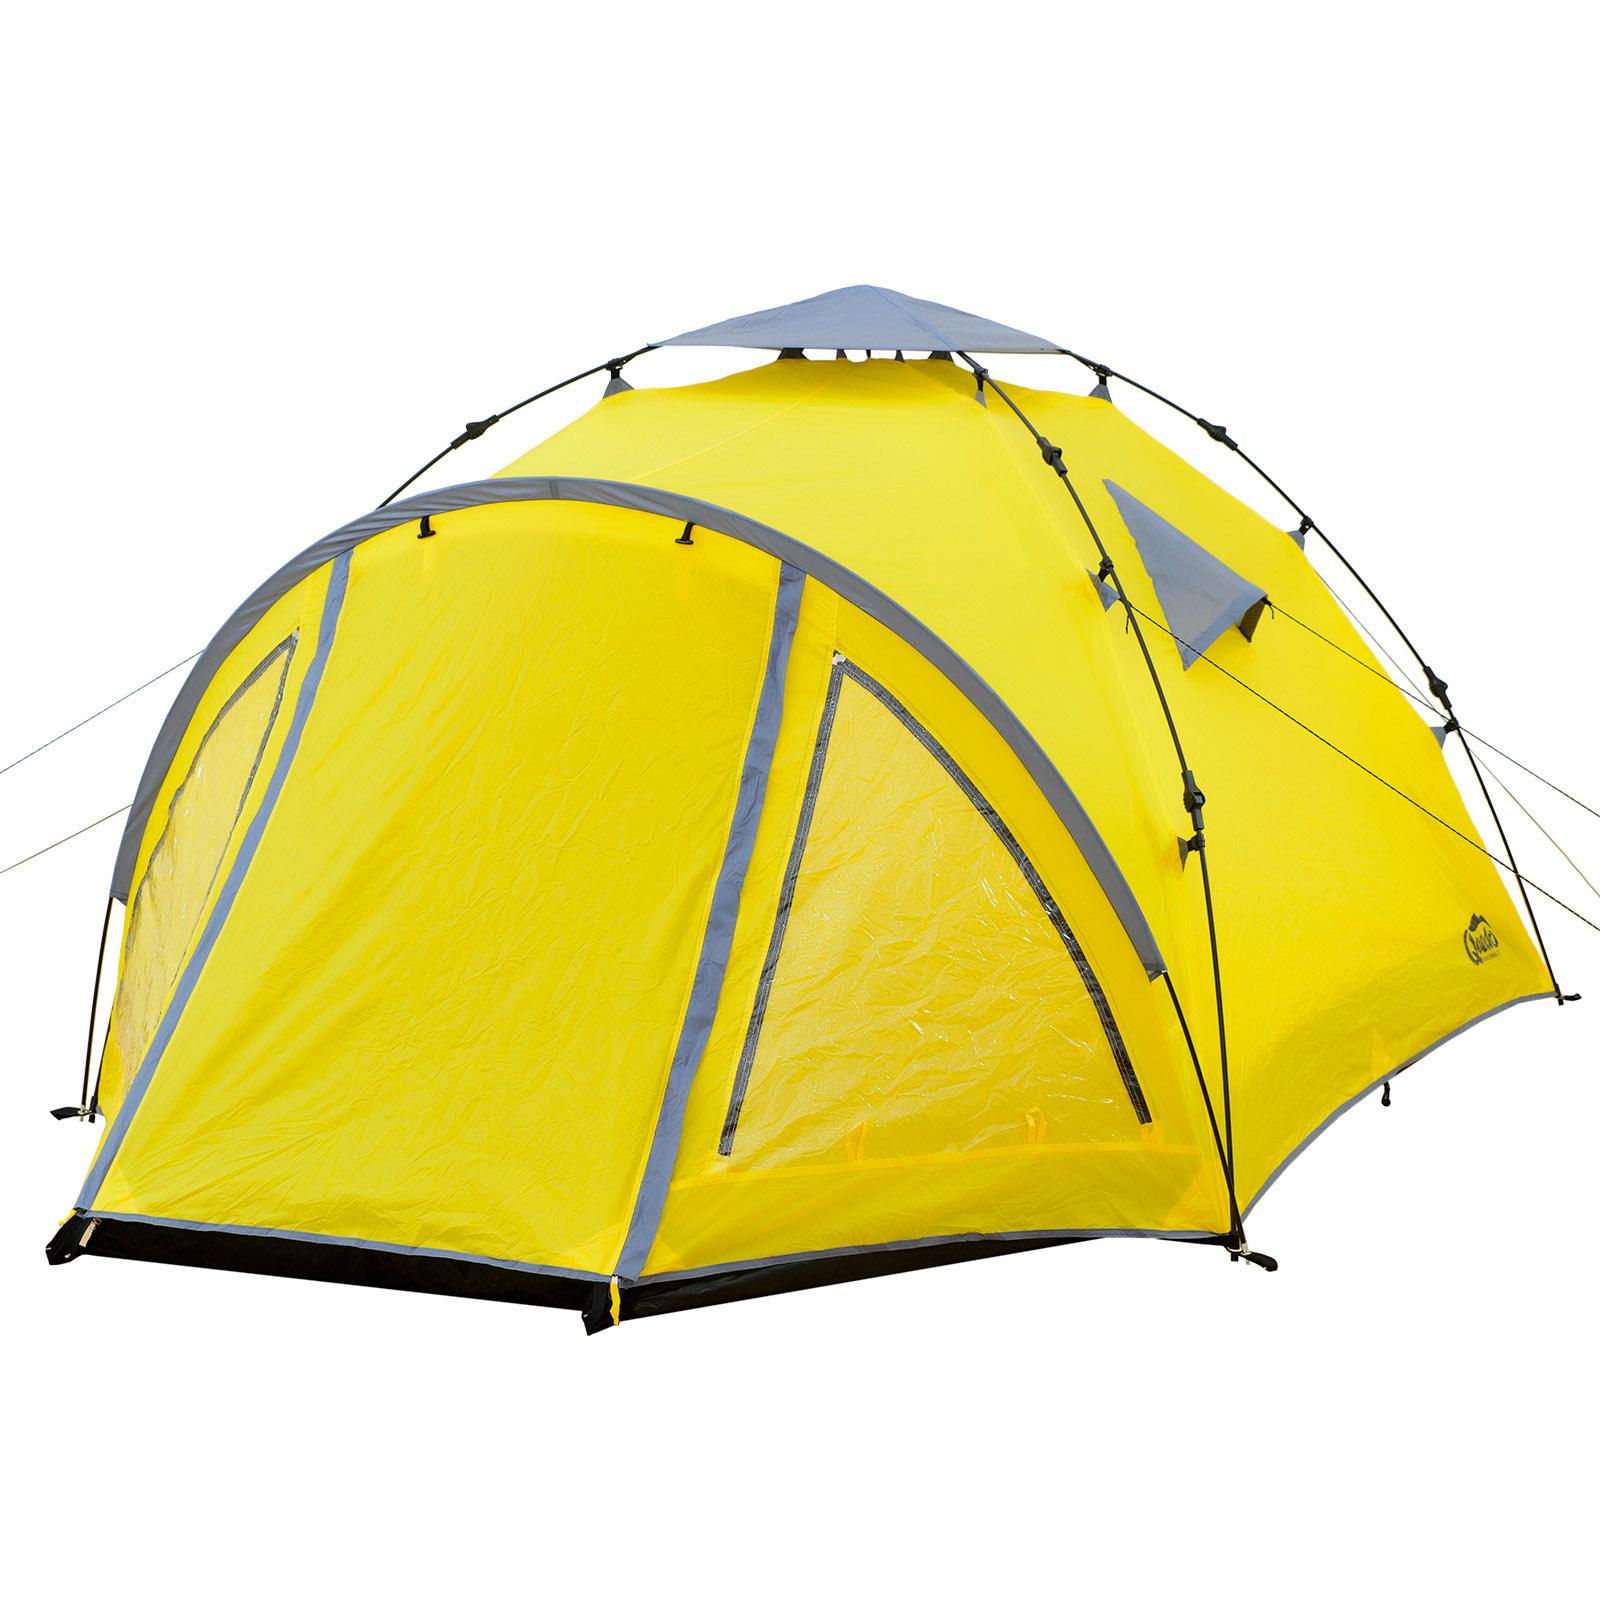 Zelt Aldi 3 Personen : Campingzelt qeedo quick oak sekundenzelt personen zelt